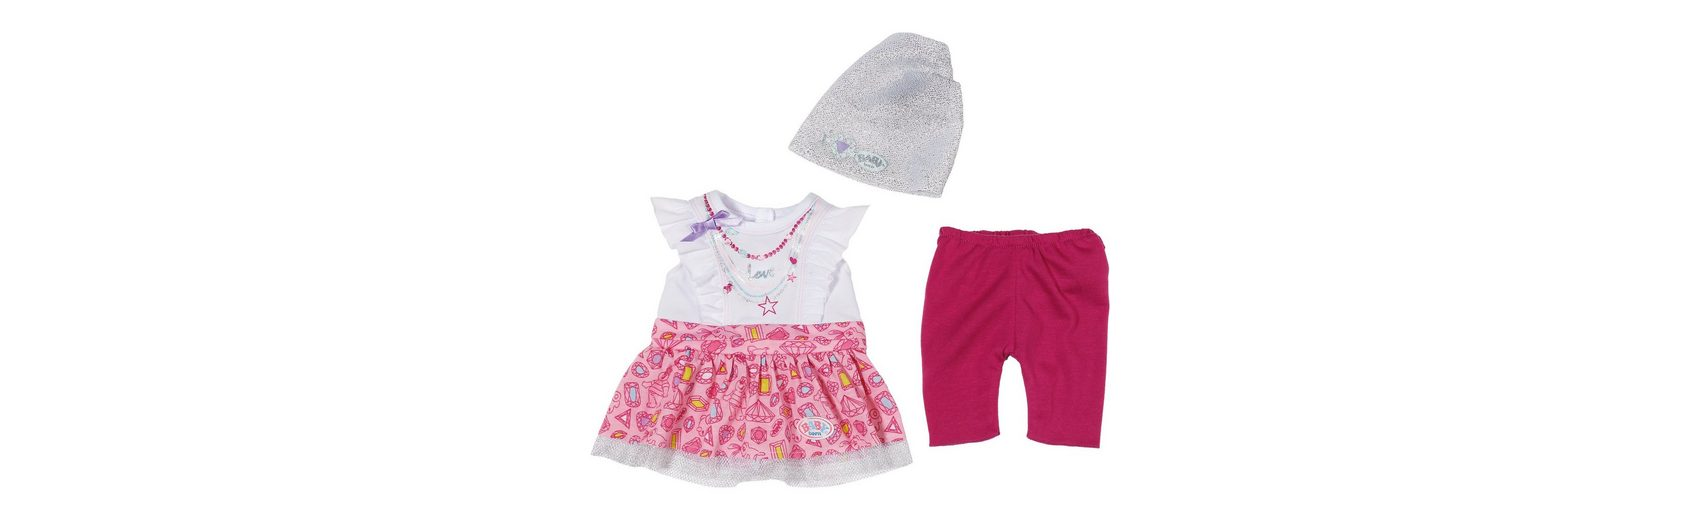 Zapf Creation BABY born® Fashion Kollektion Puppenkleidung T-Shirt, Rock,